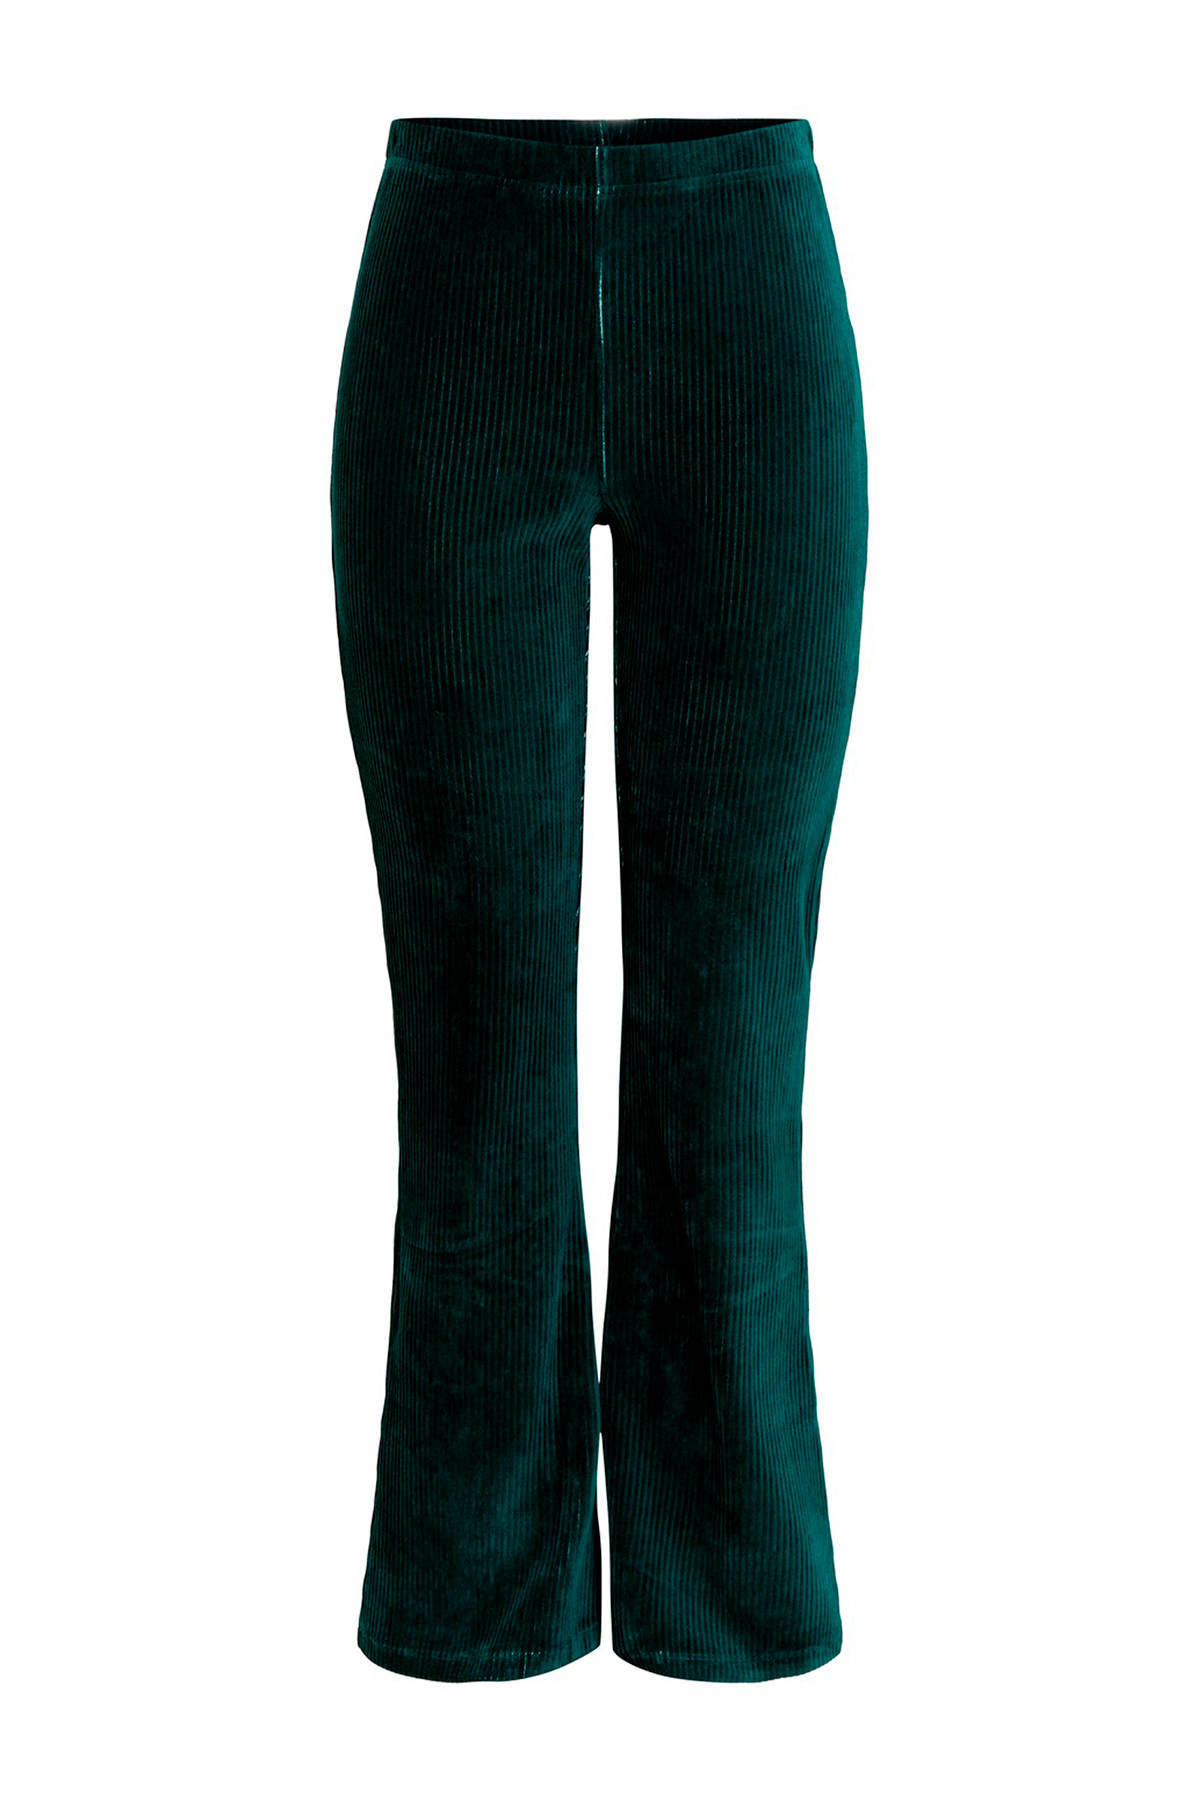 PIECES flared broek turquoise | wehkamp